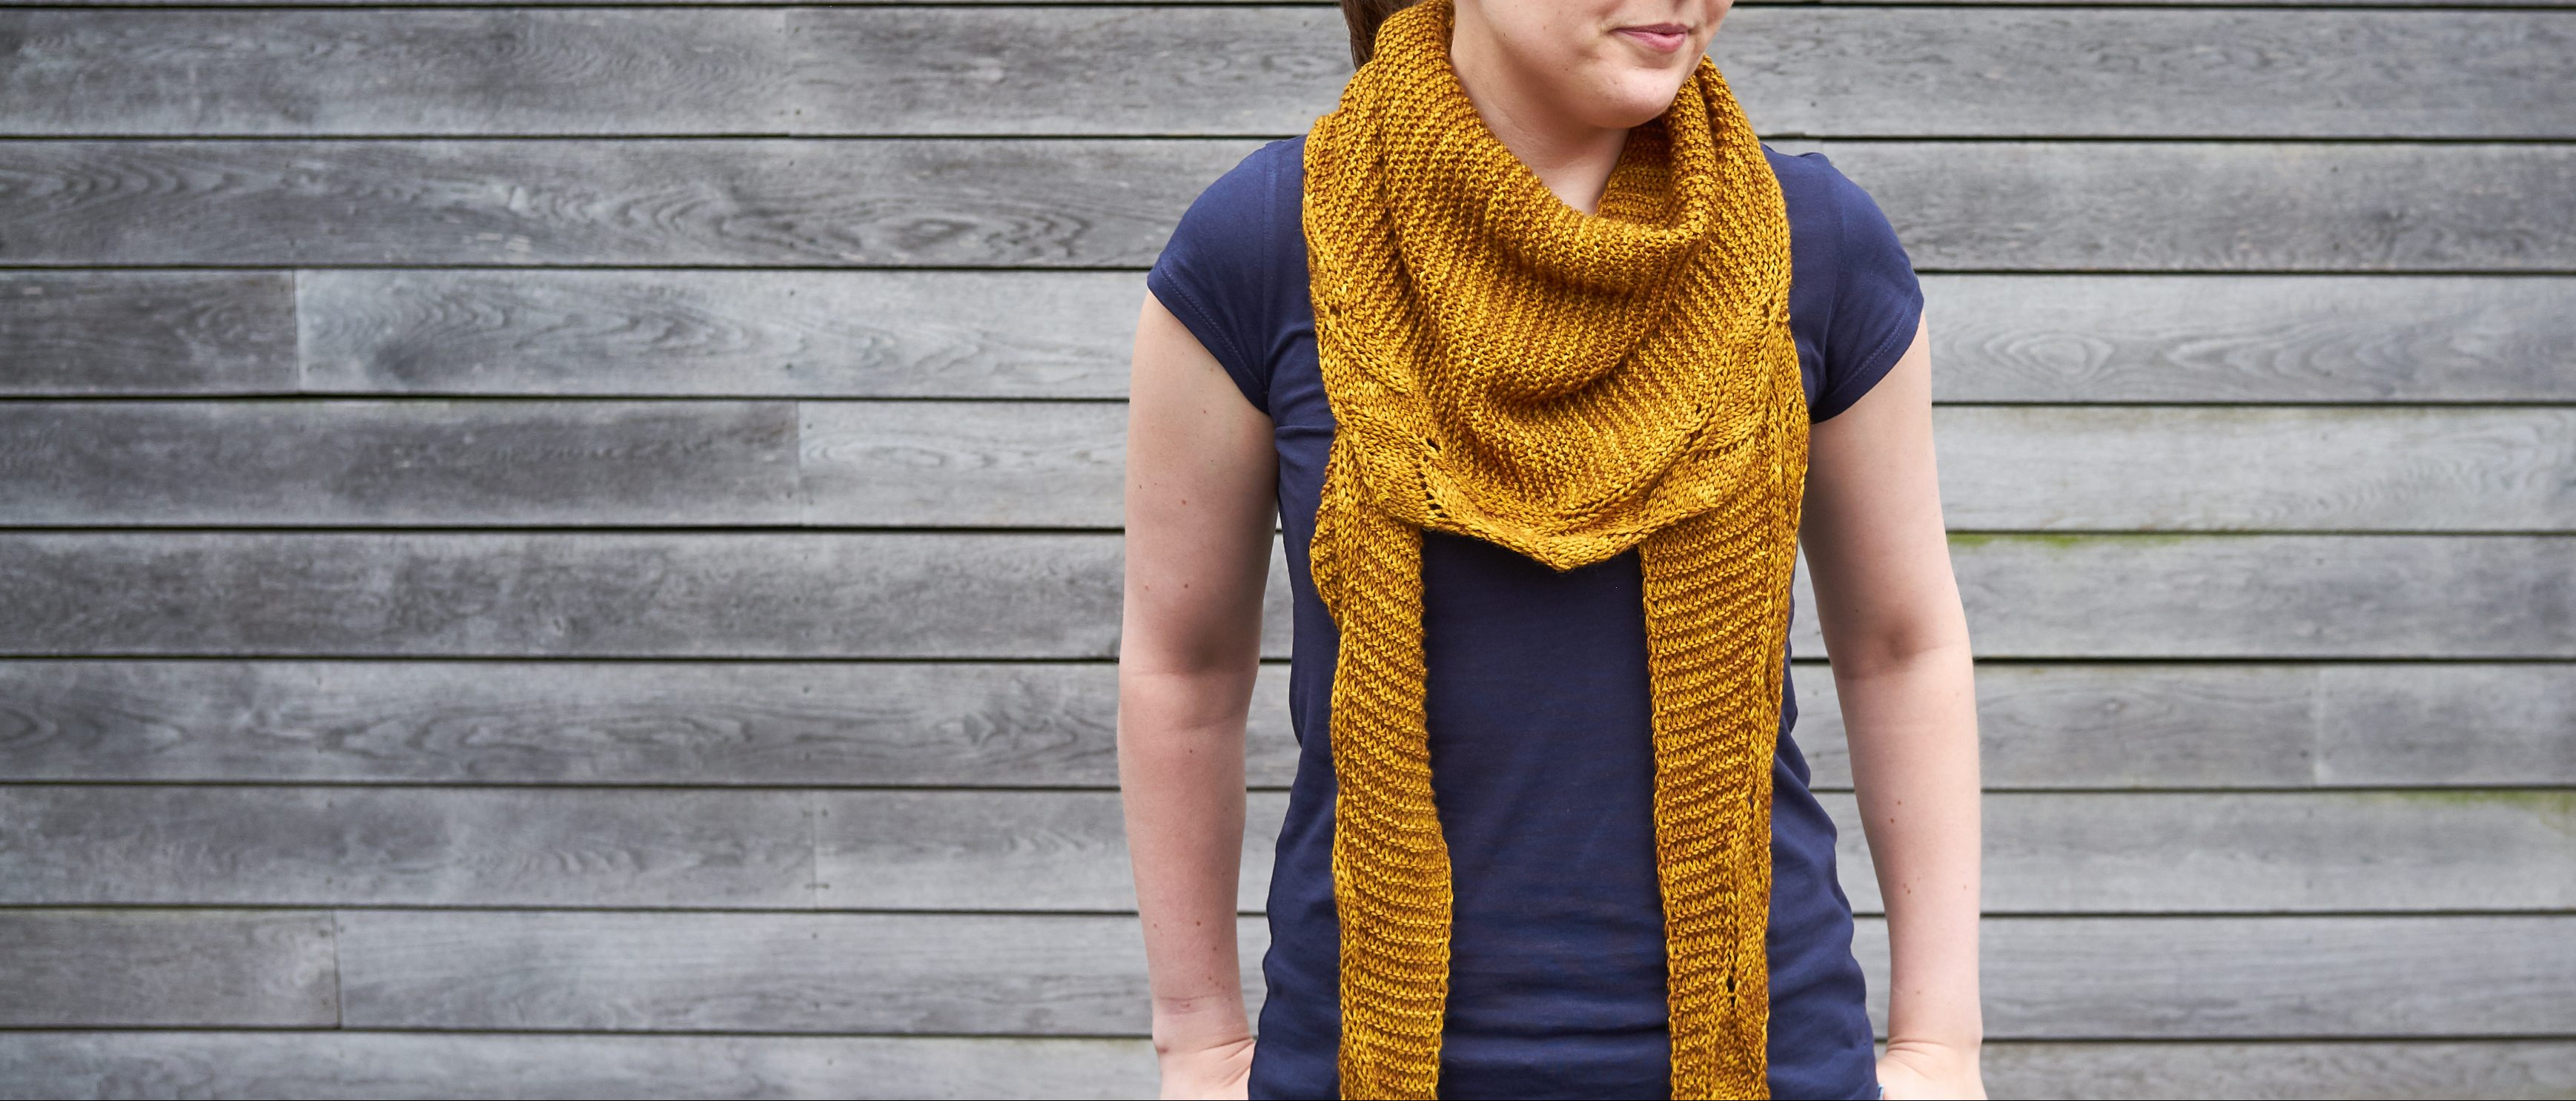 Curcuma Shawl knitting pattern | Shortrounds Knitwear